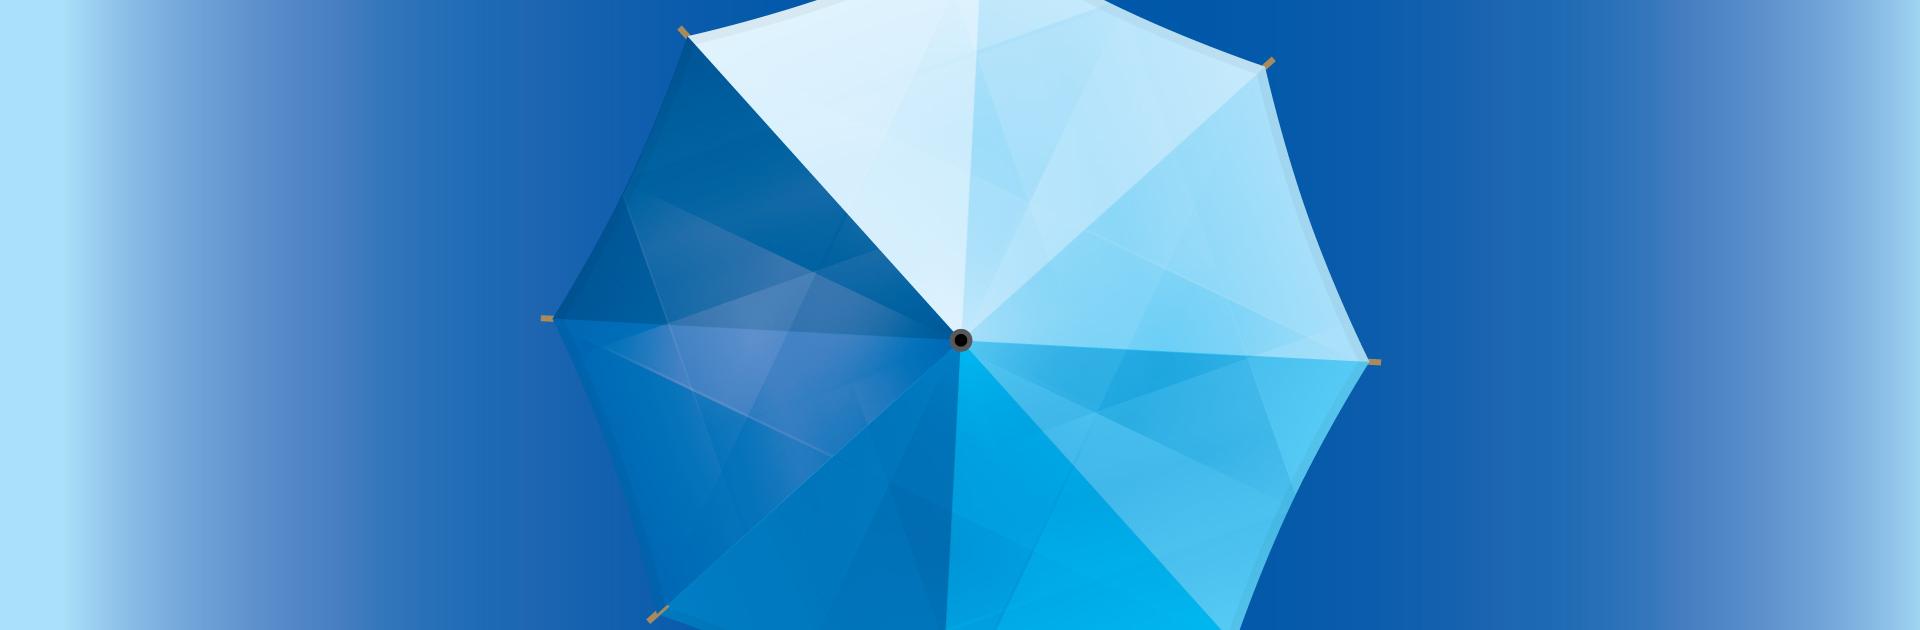 blue-background3